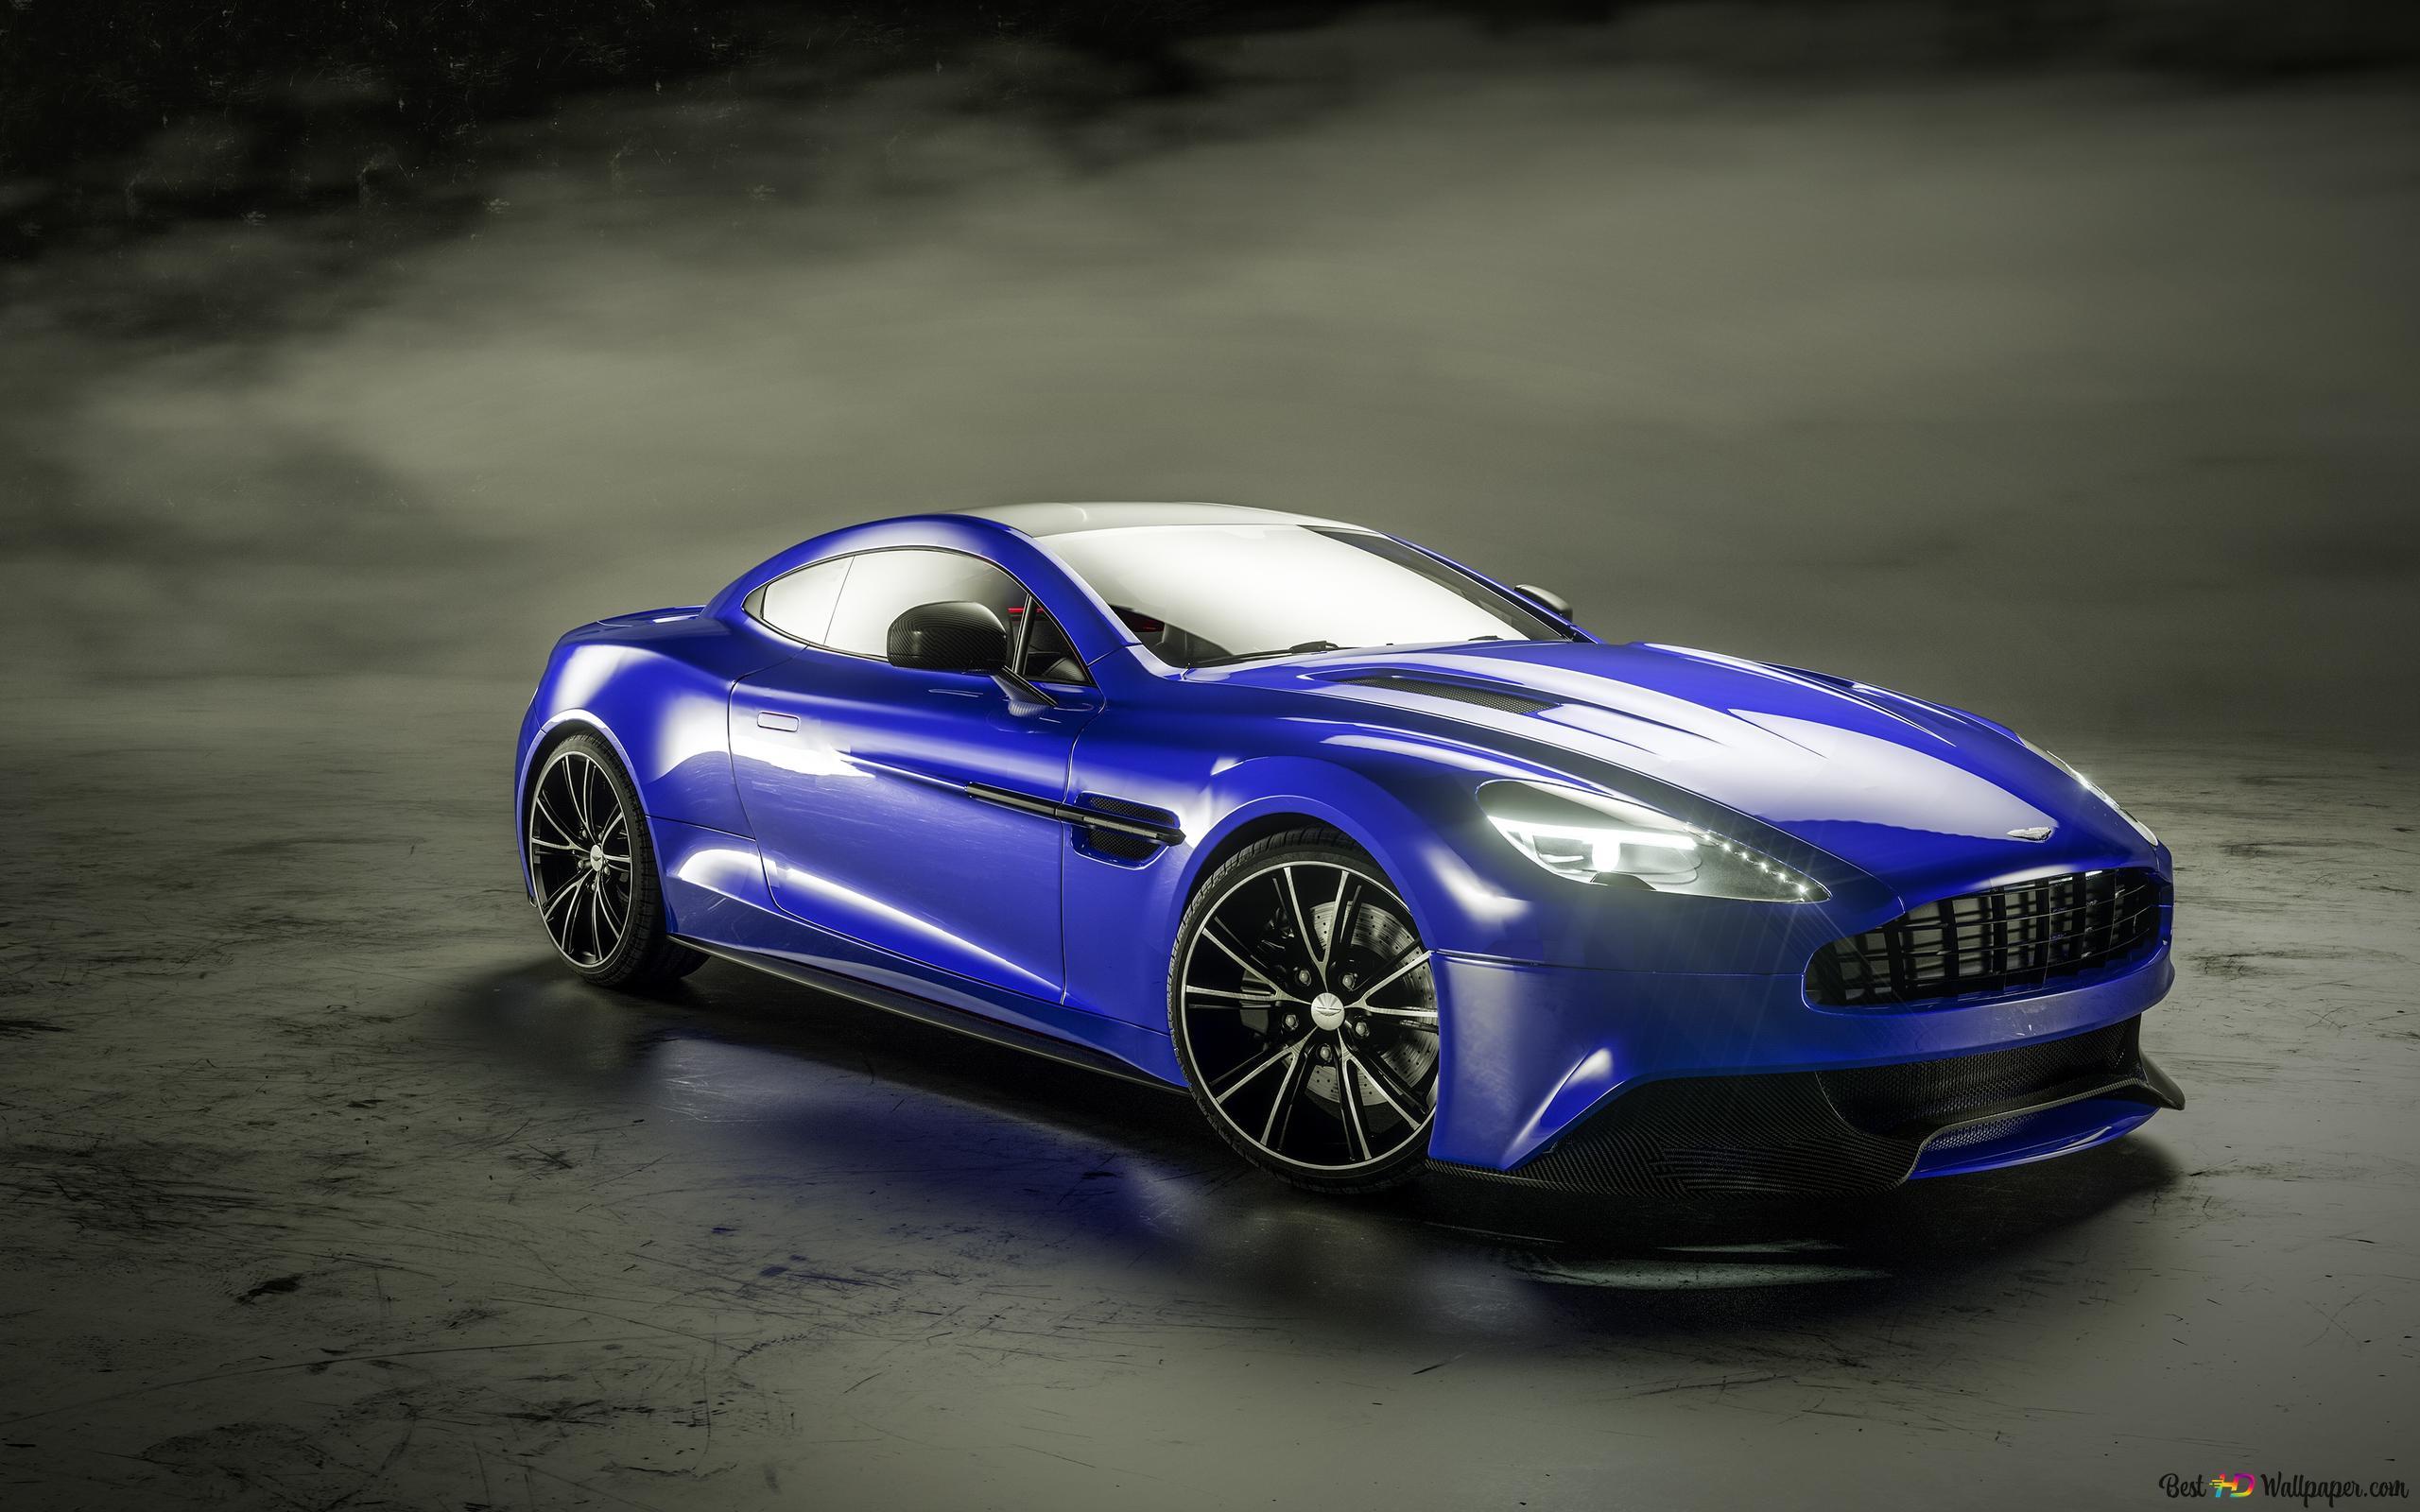 Aston Martin Vanquish Hd Wallpaper Download